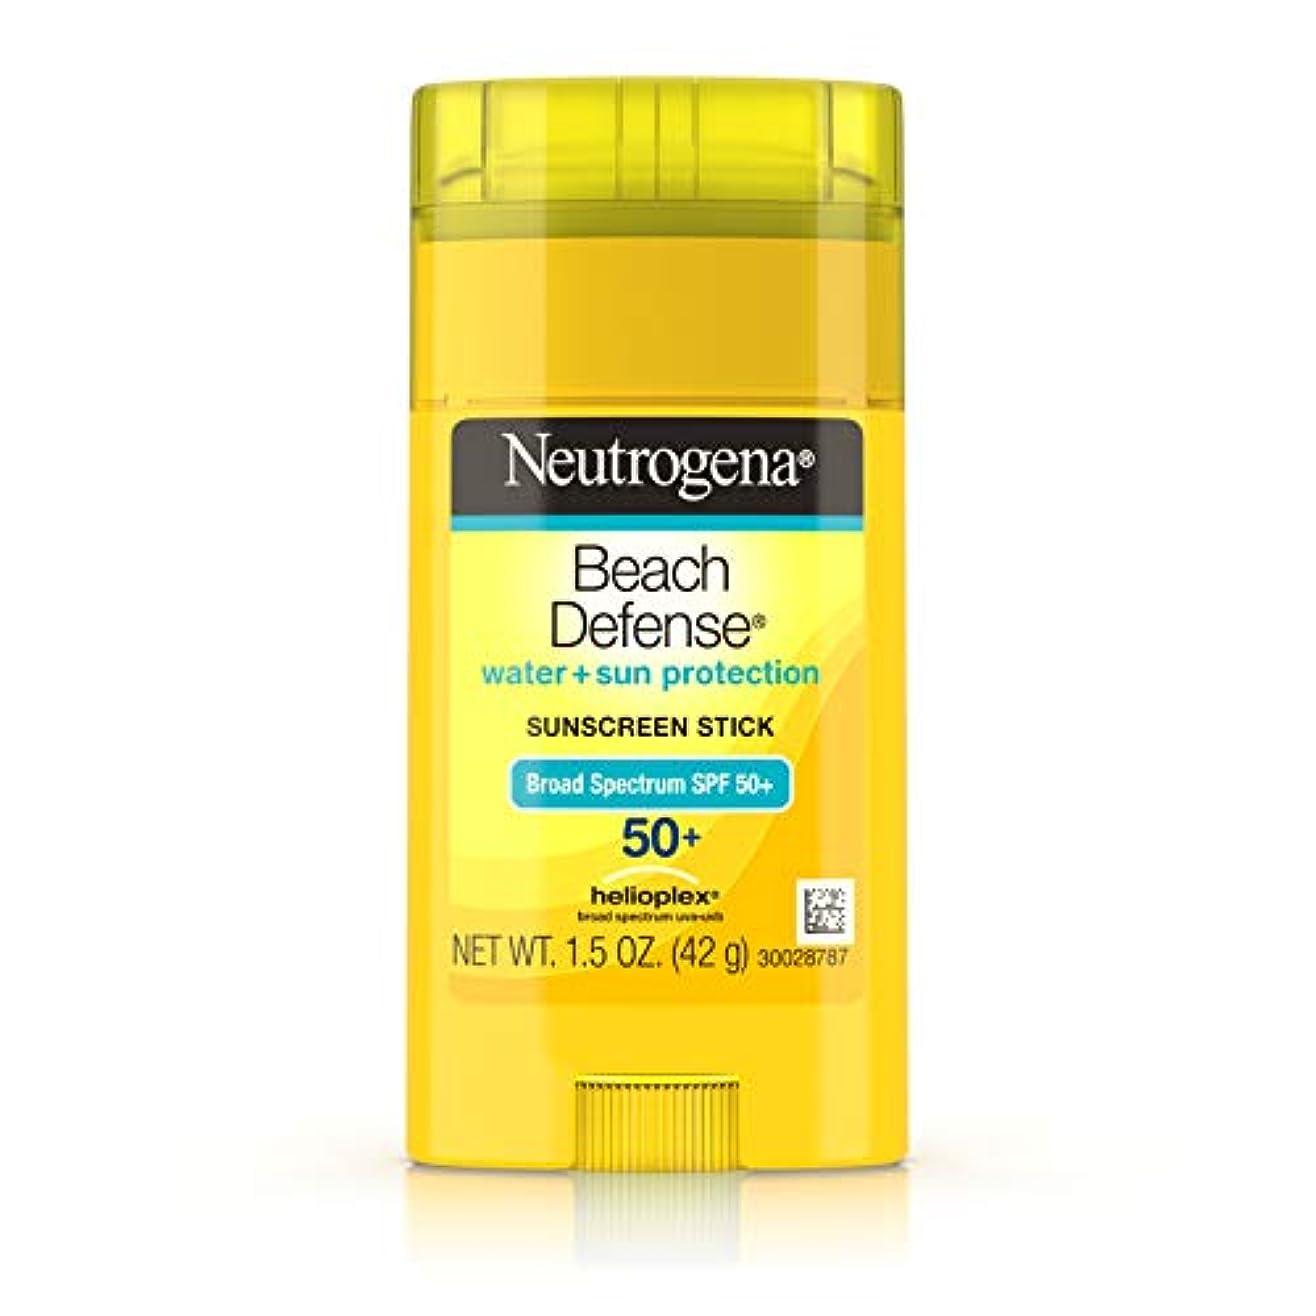 パワー契約通訳Neutrogena Sunscreen Beach Defense Sunblock Stick SPF 50, 1.5 Ounce